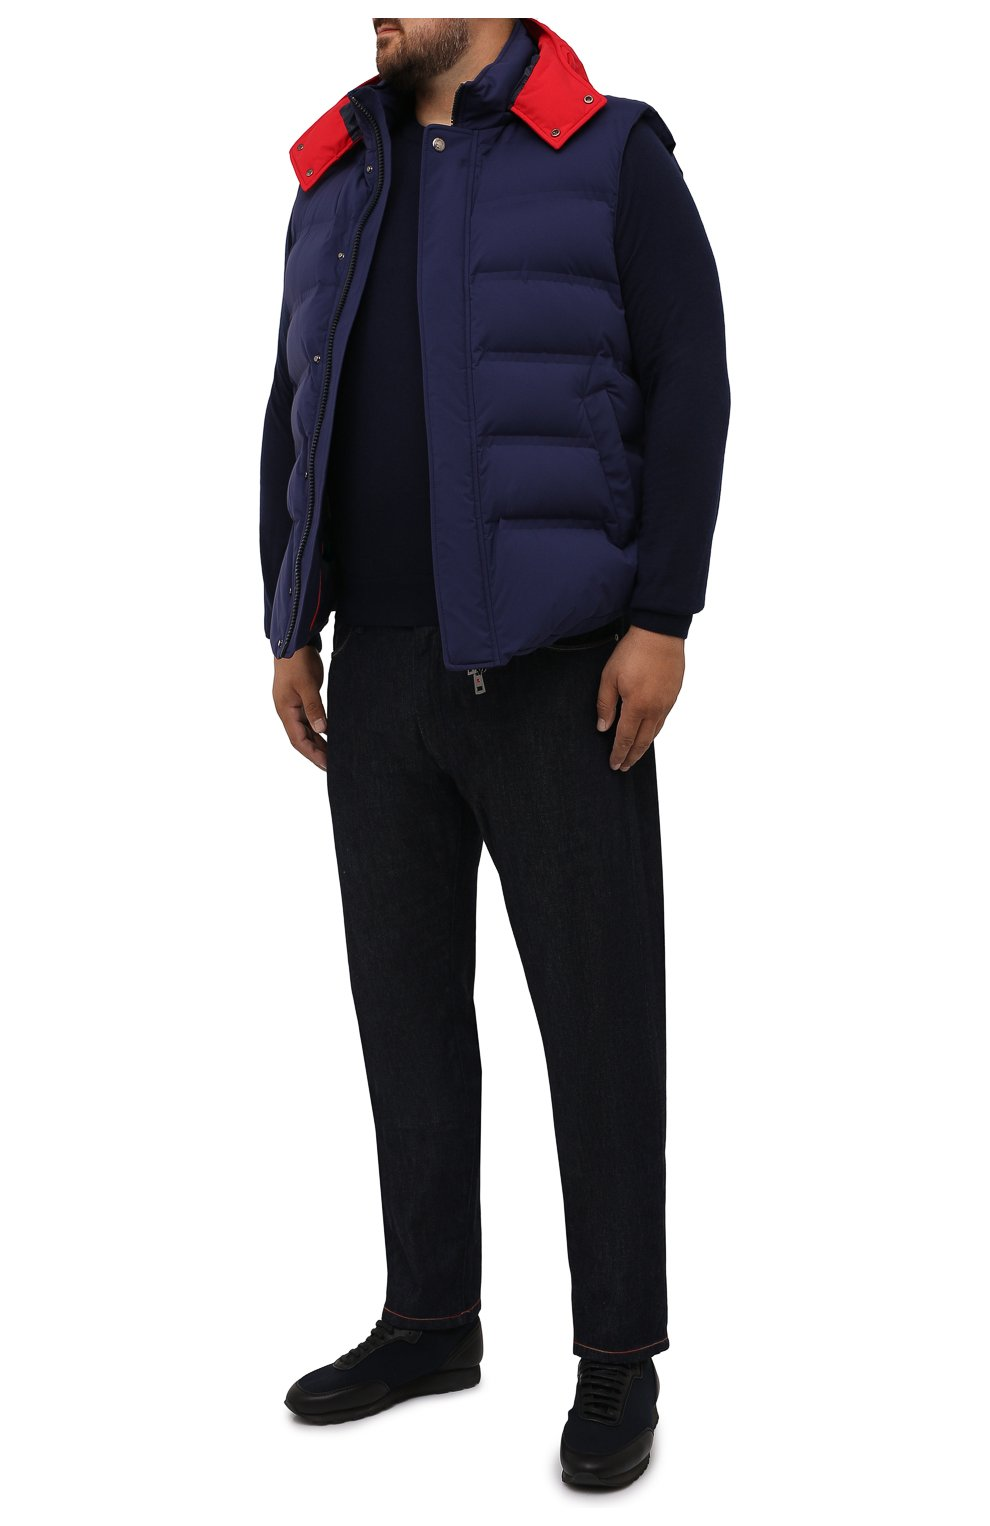 Мужской пуховый жилет KIRED темно-синего цвета, арт. WBREMAW6806518004/62-74 | Фото 2 (Кросс-КТ: Куртка, Пуховик; Big sizes: Big Sizes; Материал внешний: Синтетический материал; Стили: Спорт-шик; Материал подклада: Синтетический материал; Длина (верхняя одежда): Короткие; Материал утеплителя: Пух и перо)